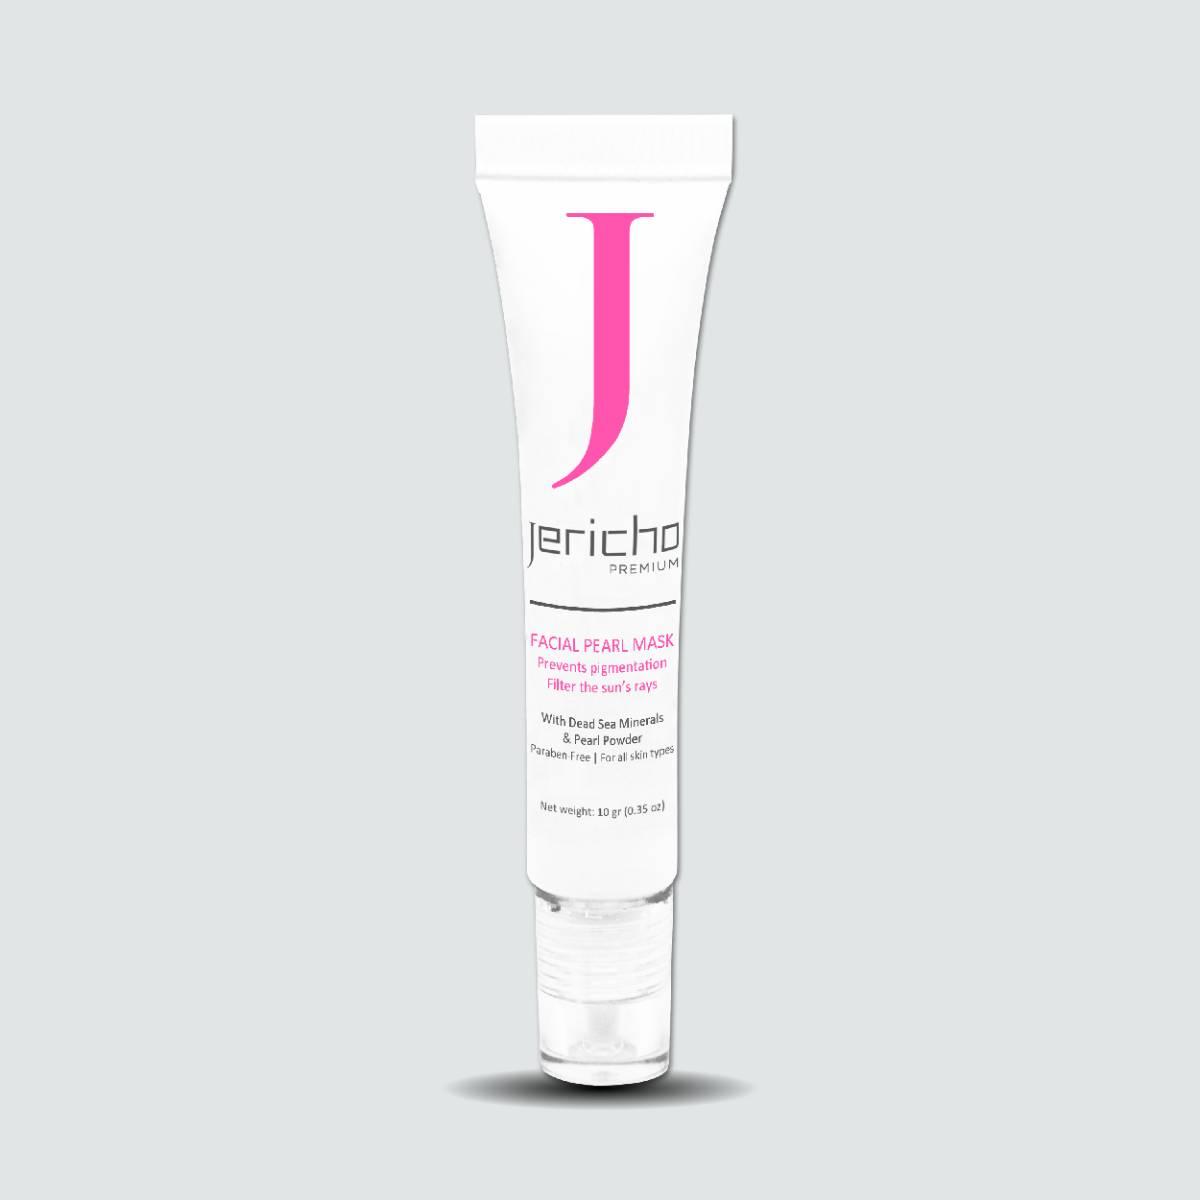 Jericho Premium Facial Pearl Mask - 10 Gr